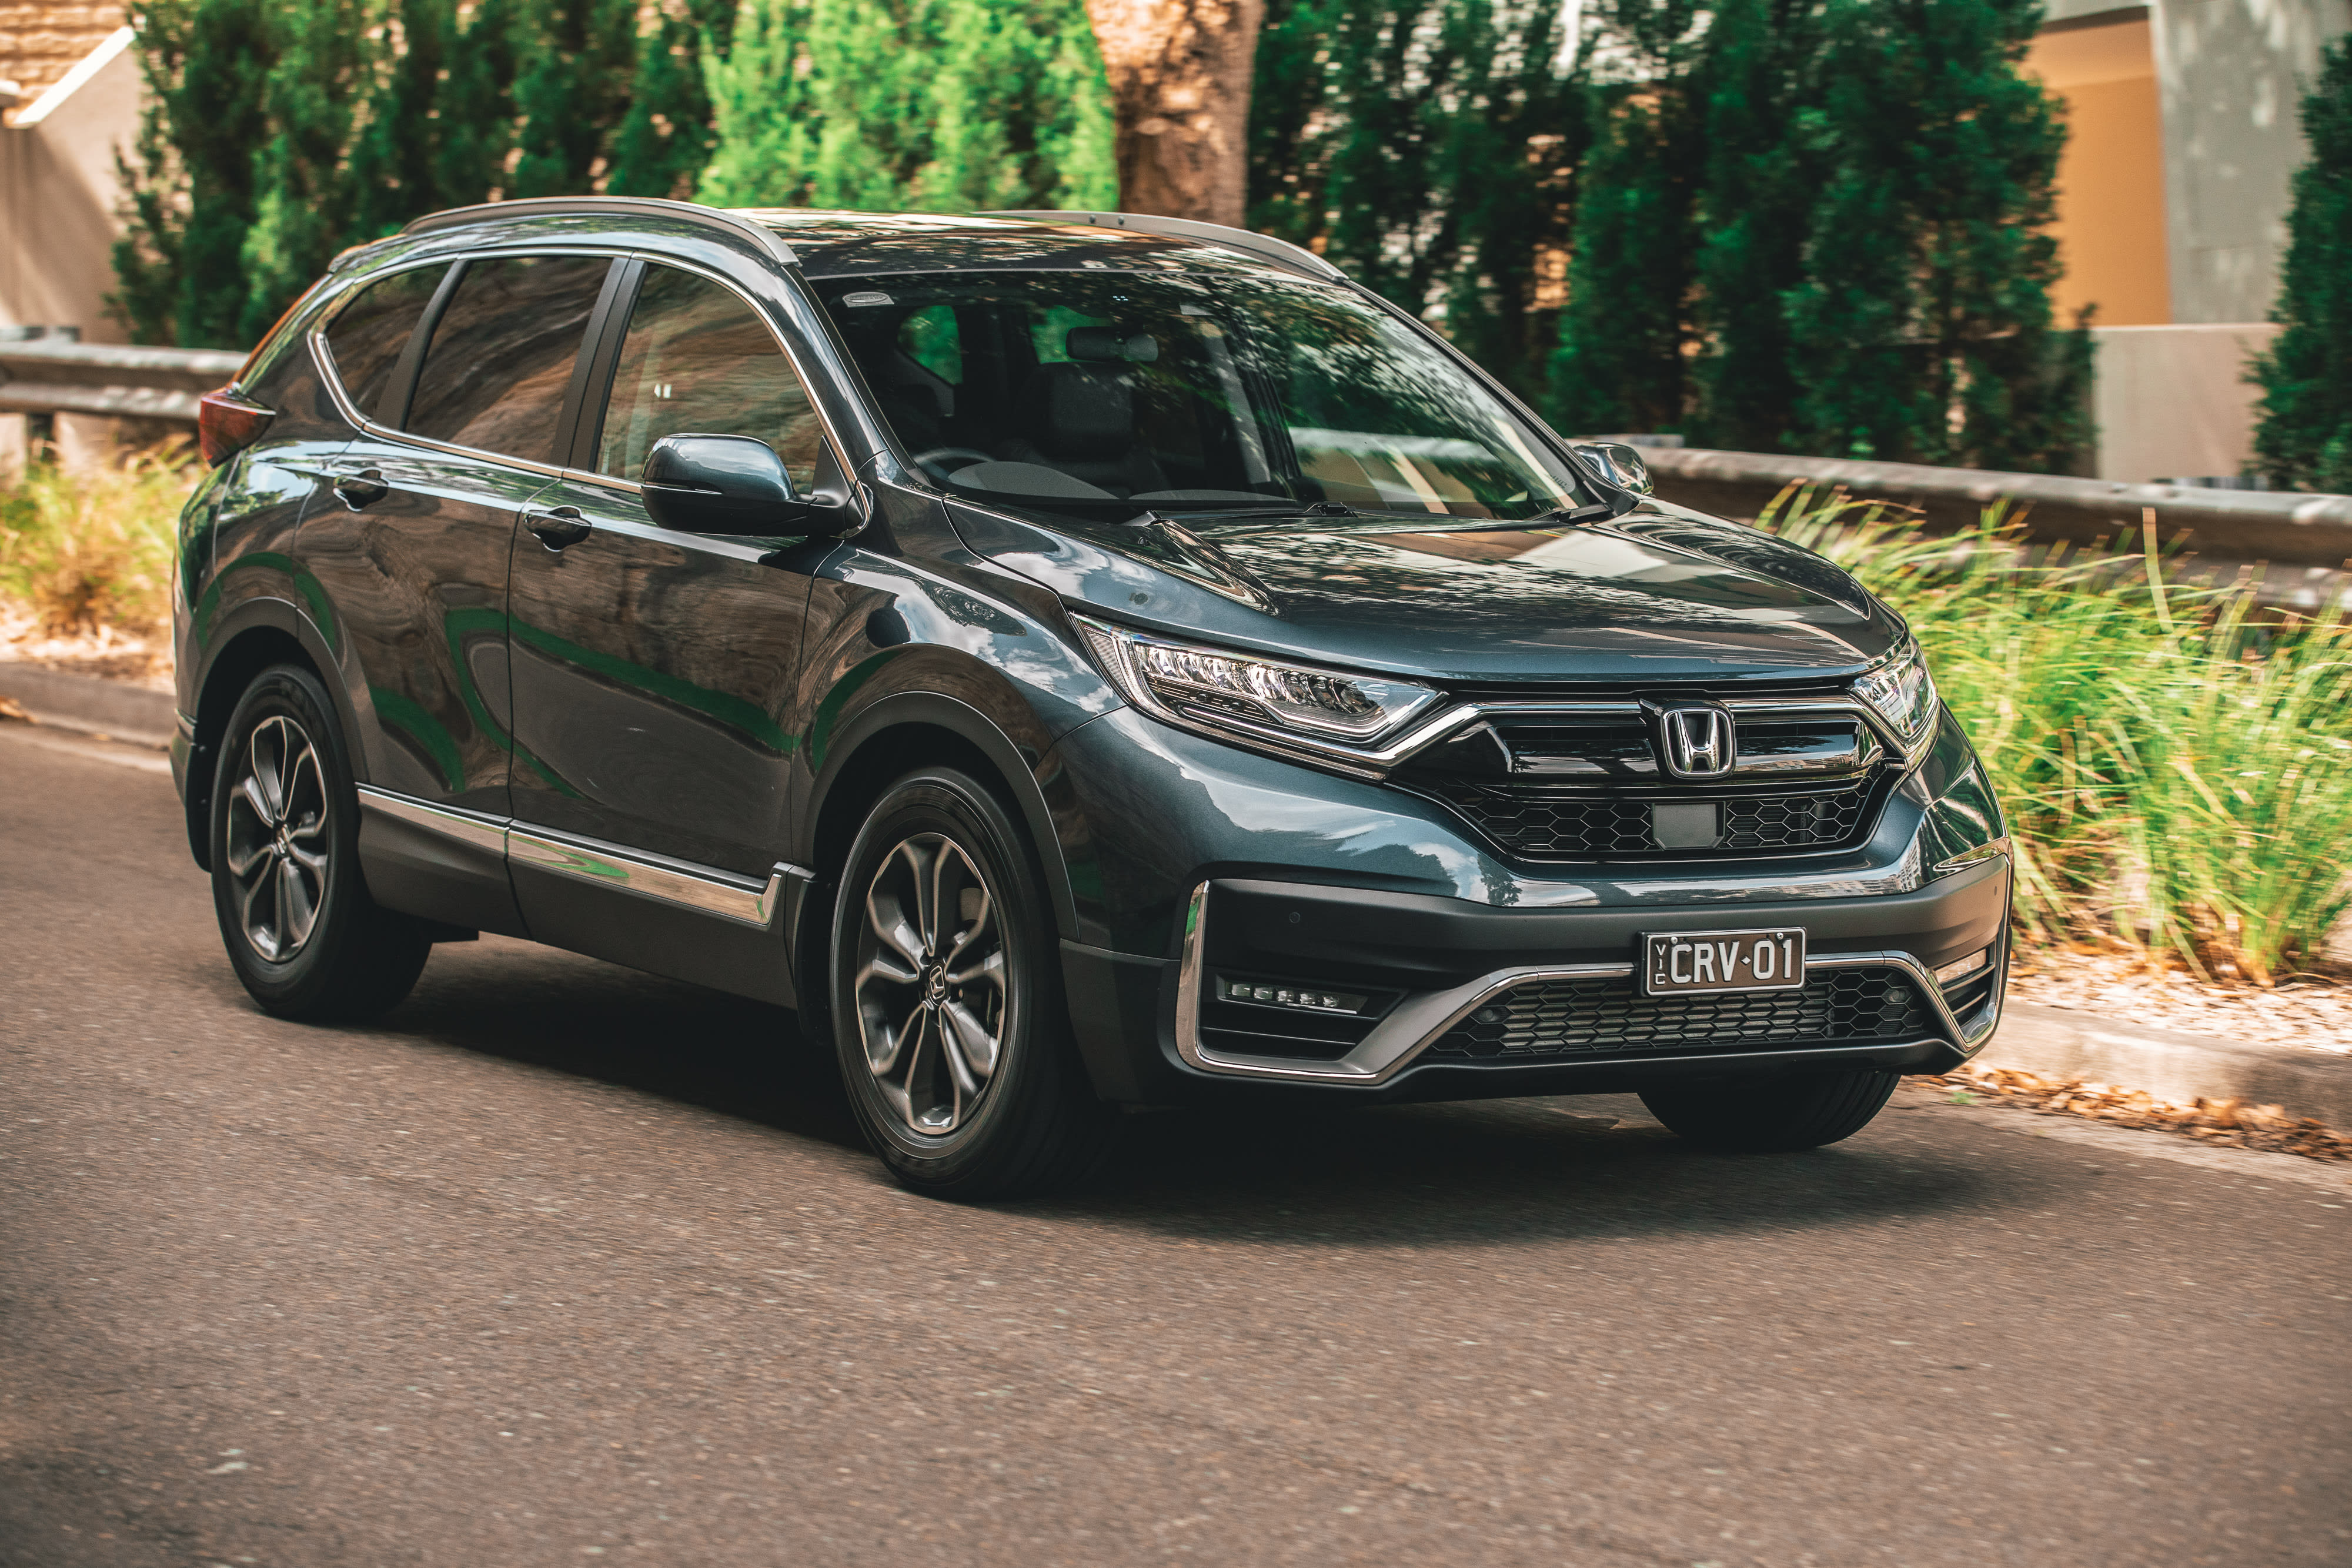 2021 Honda CR-V VTi L7 review